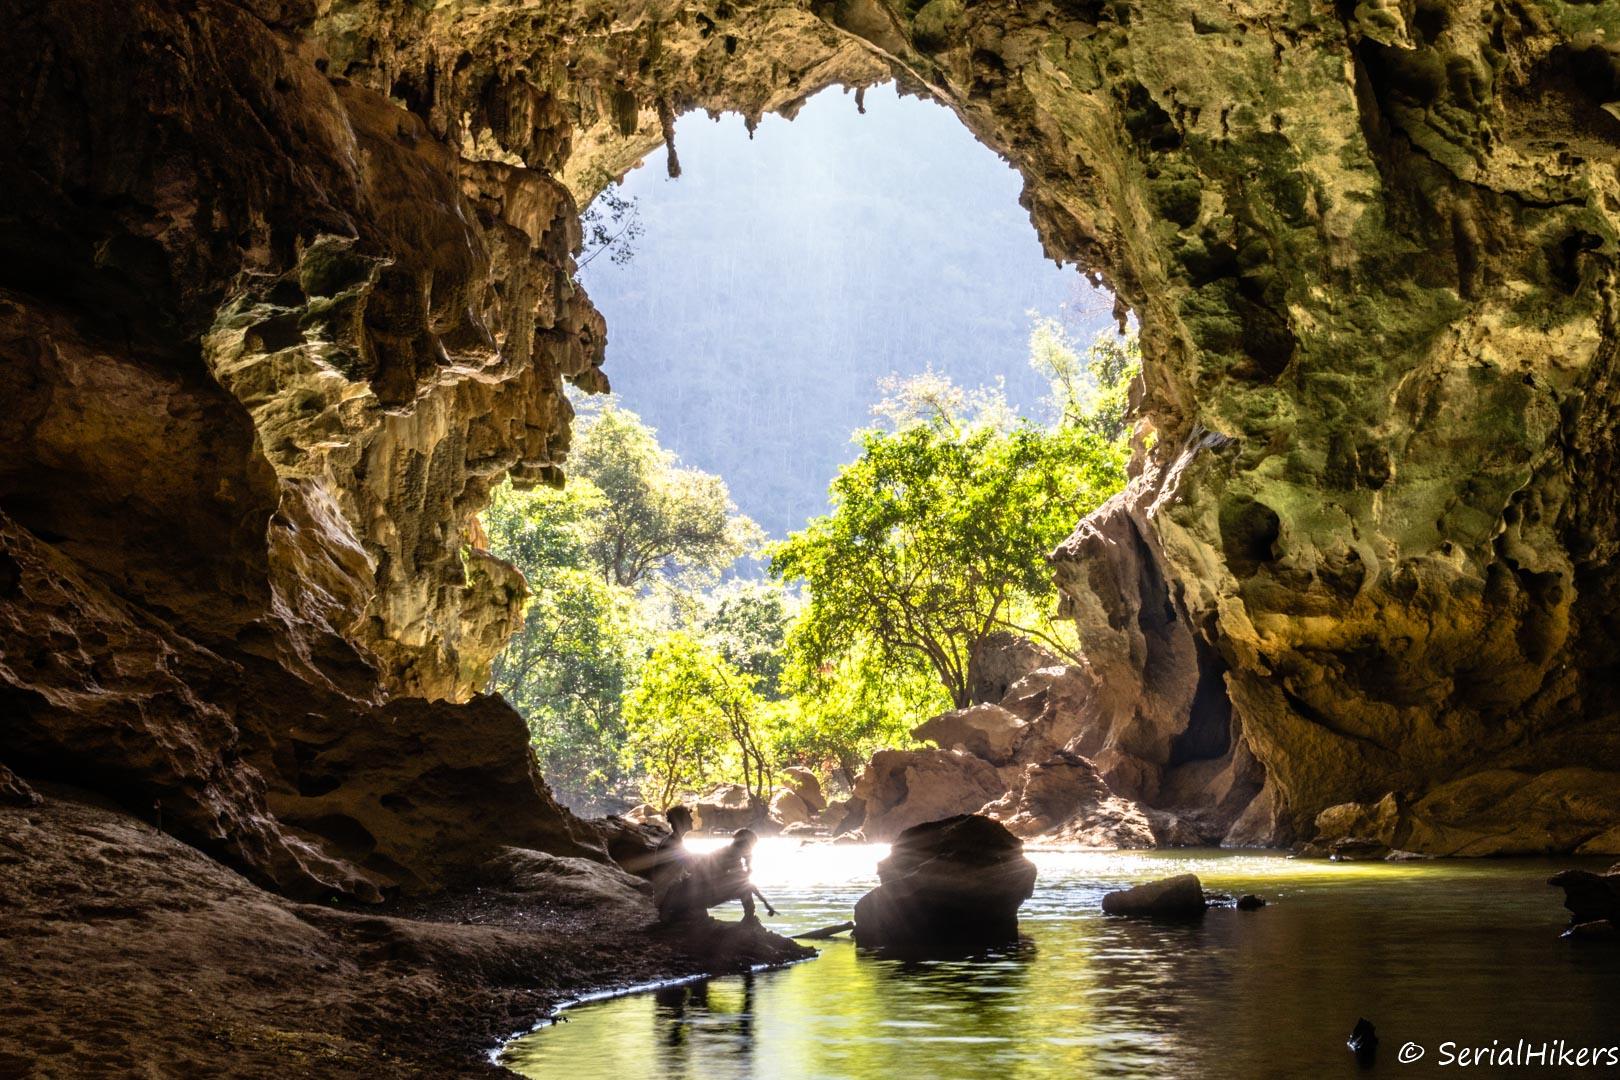 SerialHikers stop autostop world monde tour hitchhiking aventure adventure alternative travel voyage sans avion no fly Laos Mahaxay boucle Thakhek loop